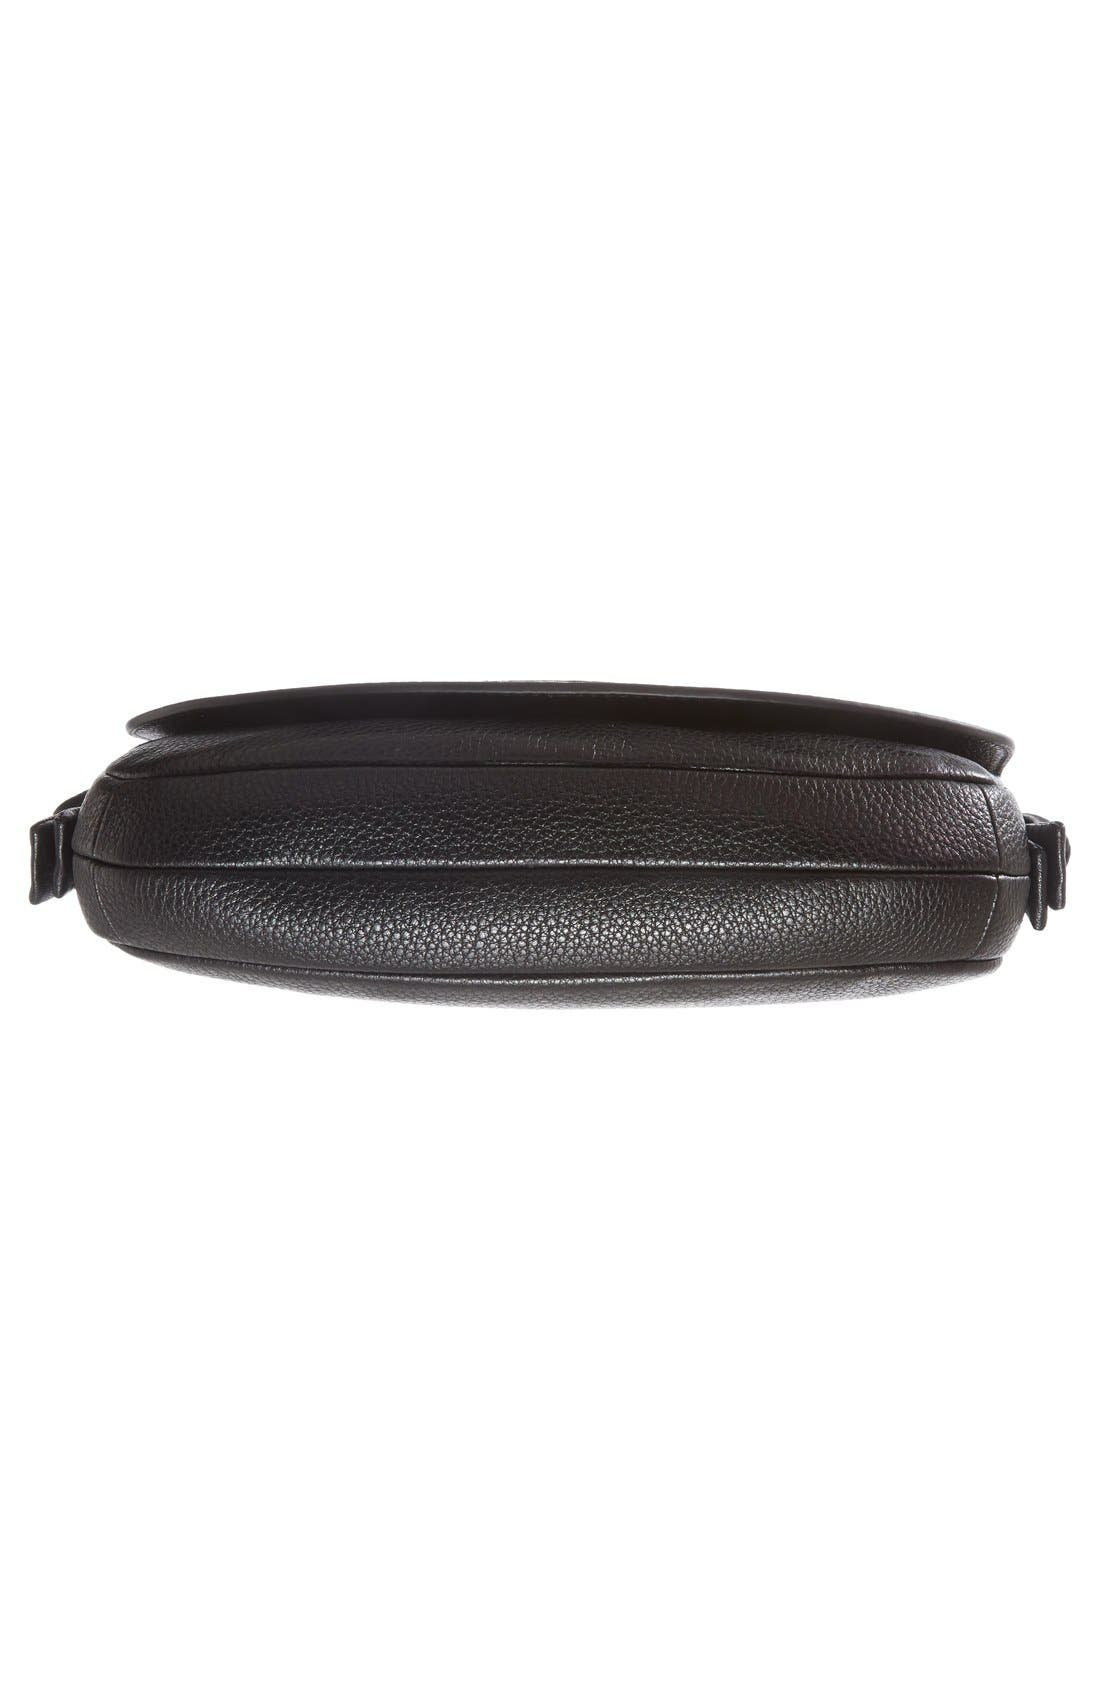 Mini Harper Leather Crossbody Bag,                             Alternate thumbnail 5, color,                             Black